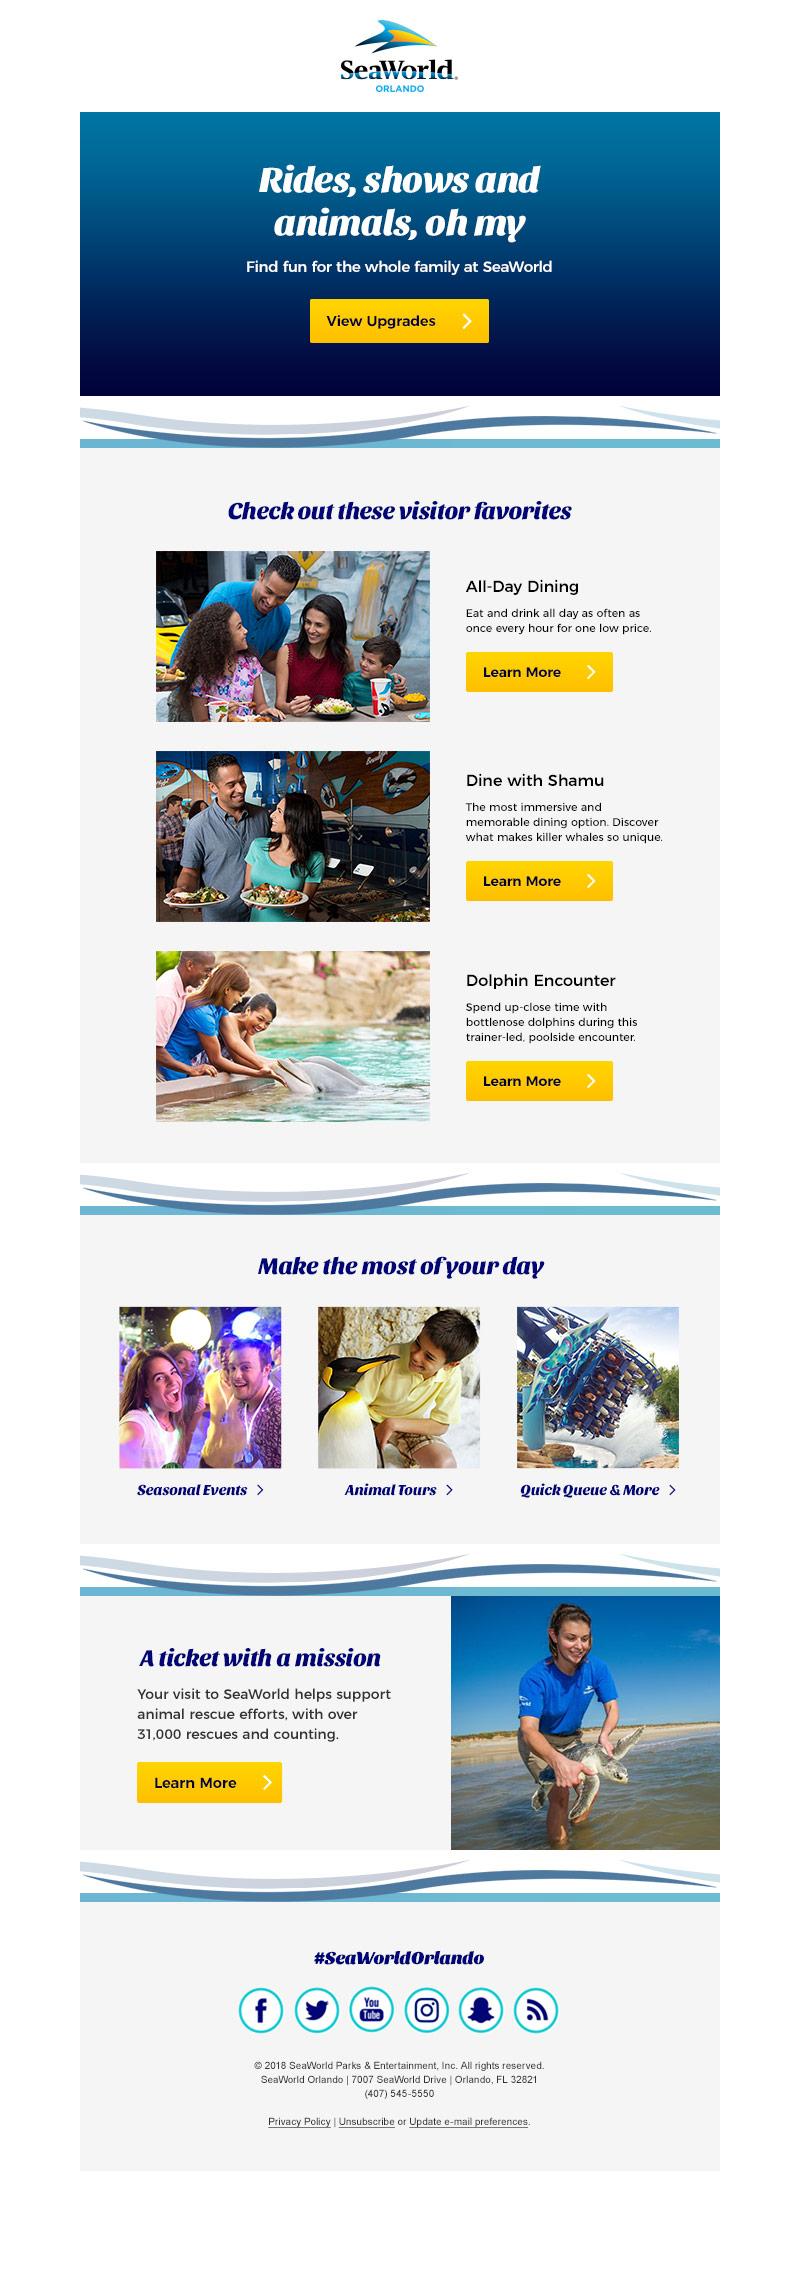 Post purchase upgrade email (SeaWorld Orlando)